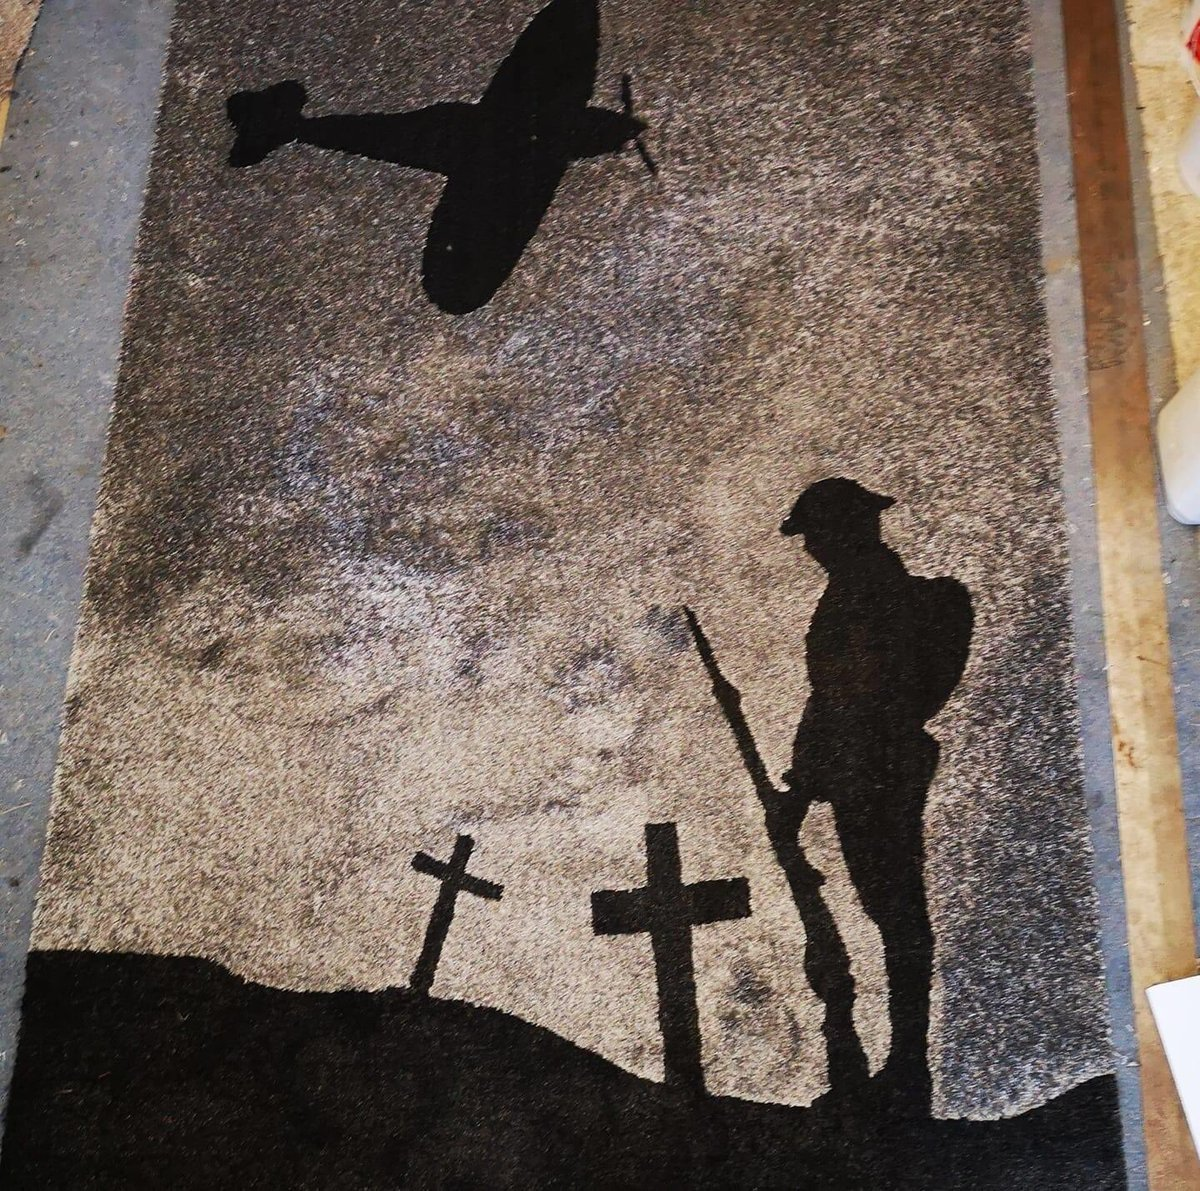 Some more carpet art by fitter member Alec Torbet